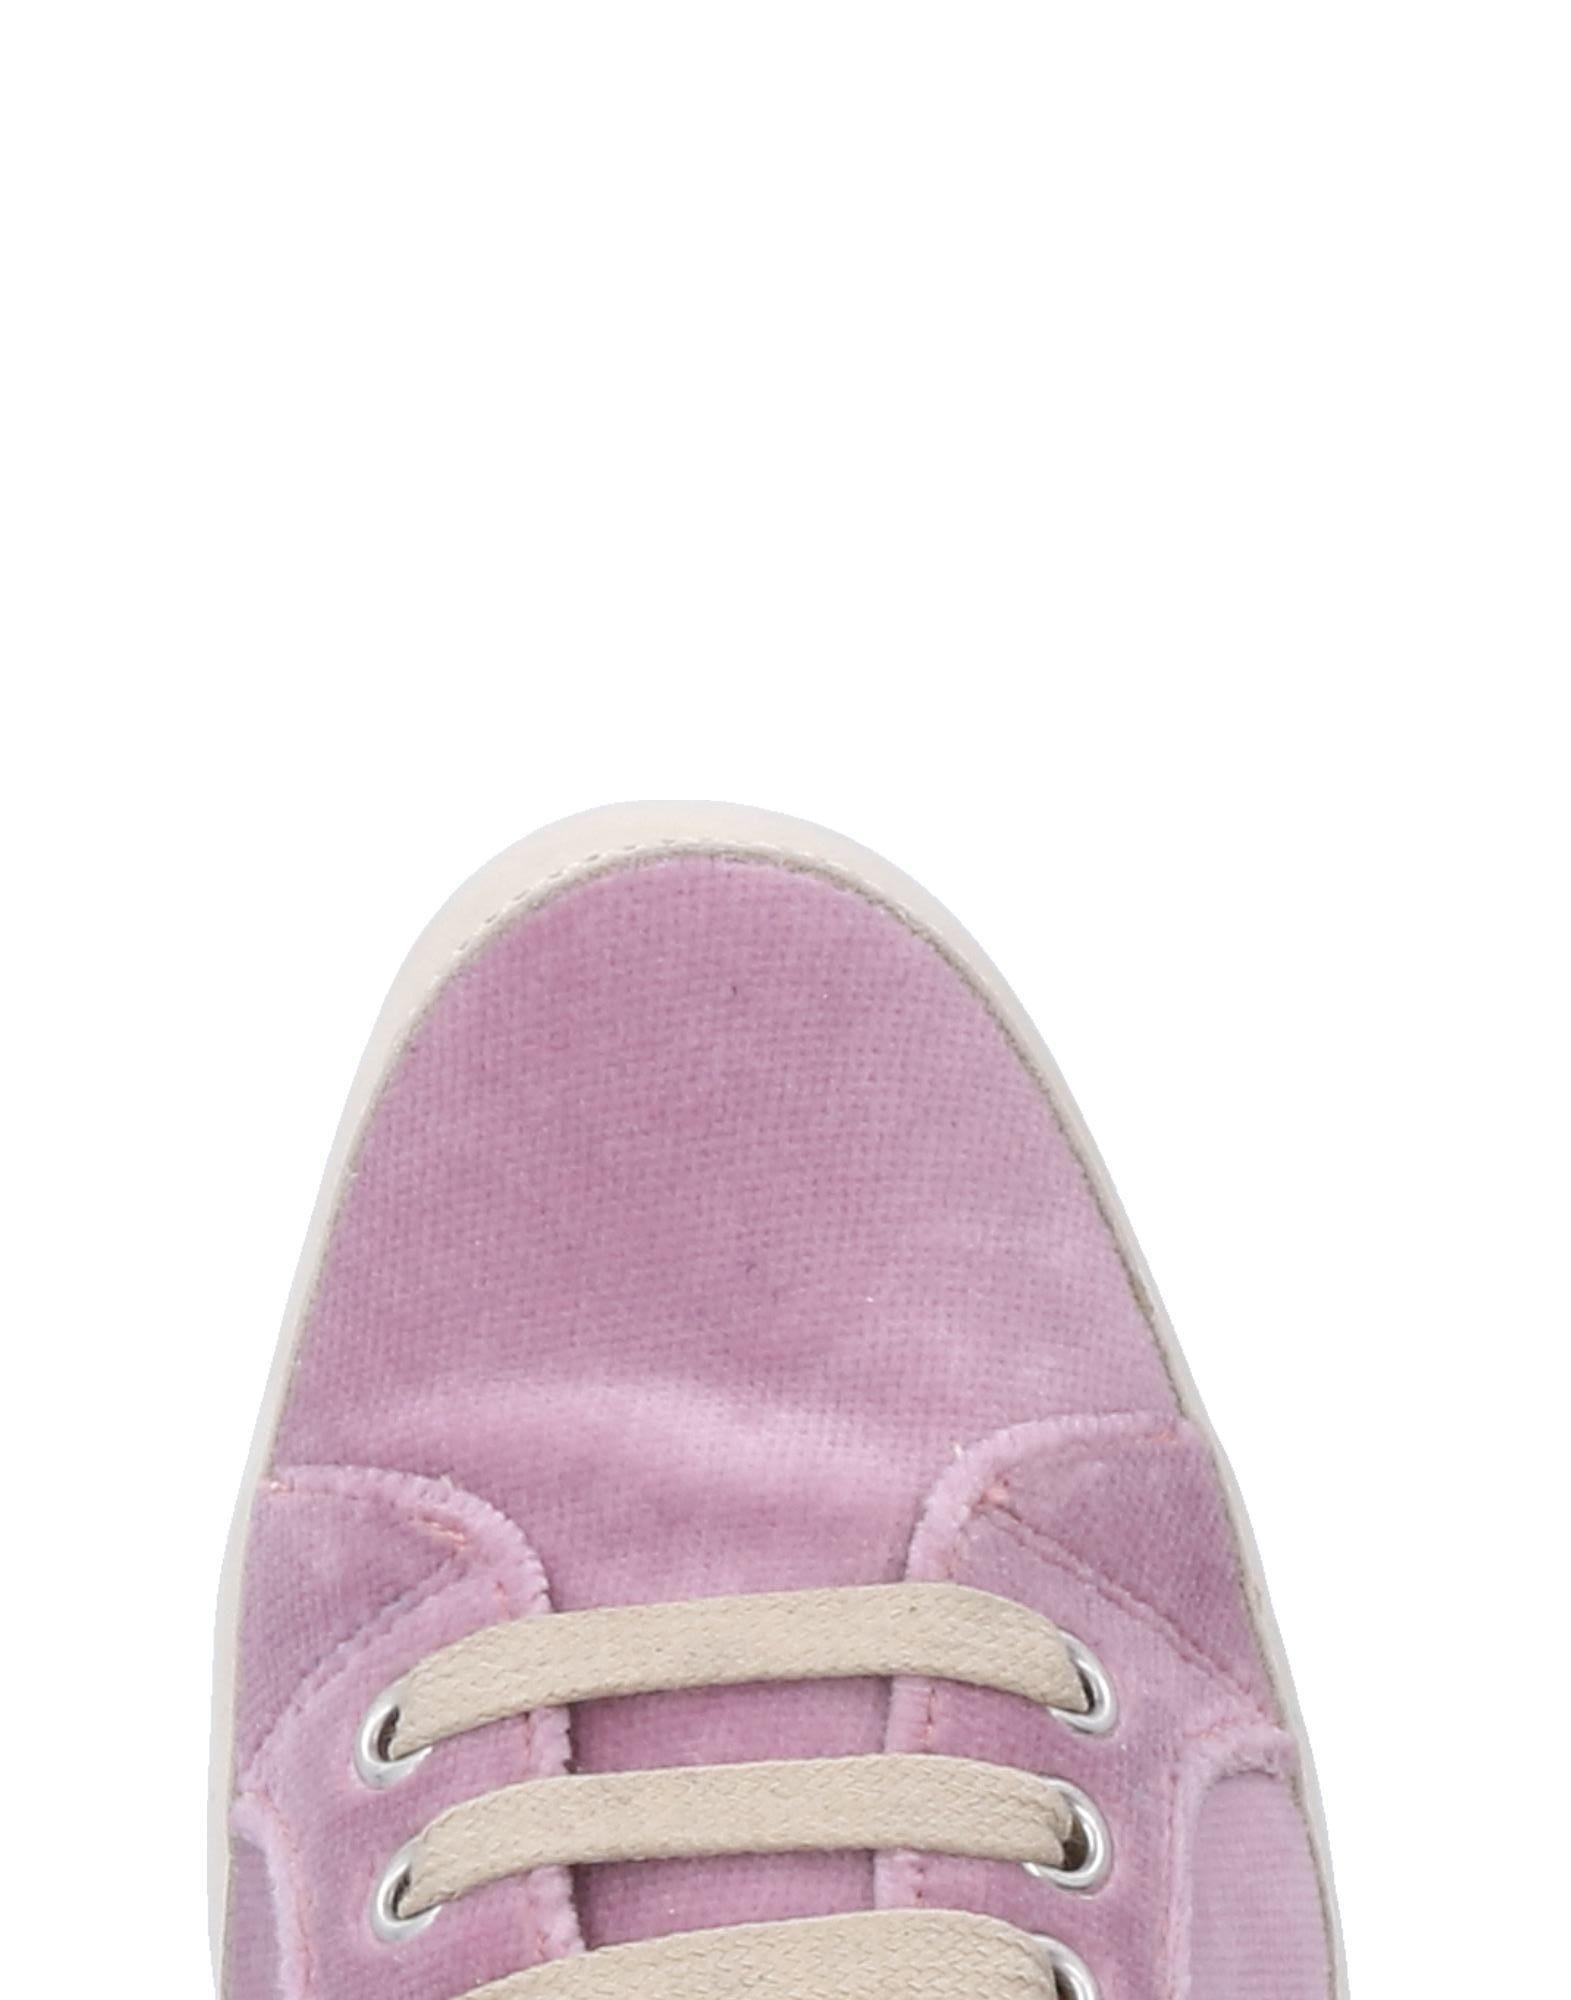 Emma Hope Sneakers aussehende Damen  11499387PEGut aussehende Sneakers strapazierfähige Schuhe 1f68b1